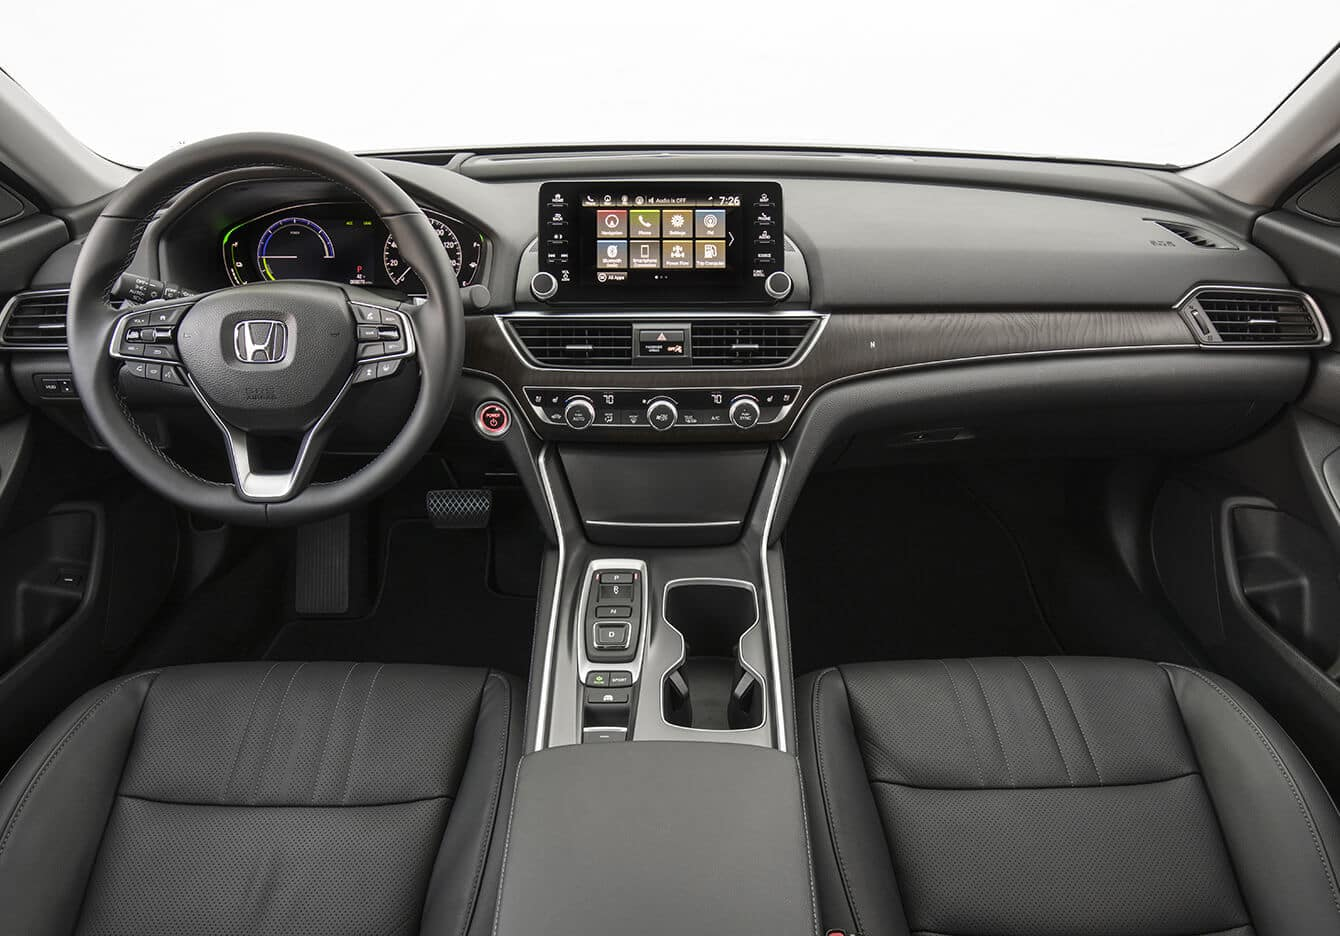 2020 Honda Accord Hybrid Interior Cockpit Overview